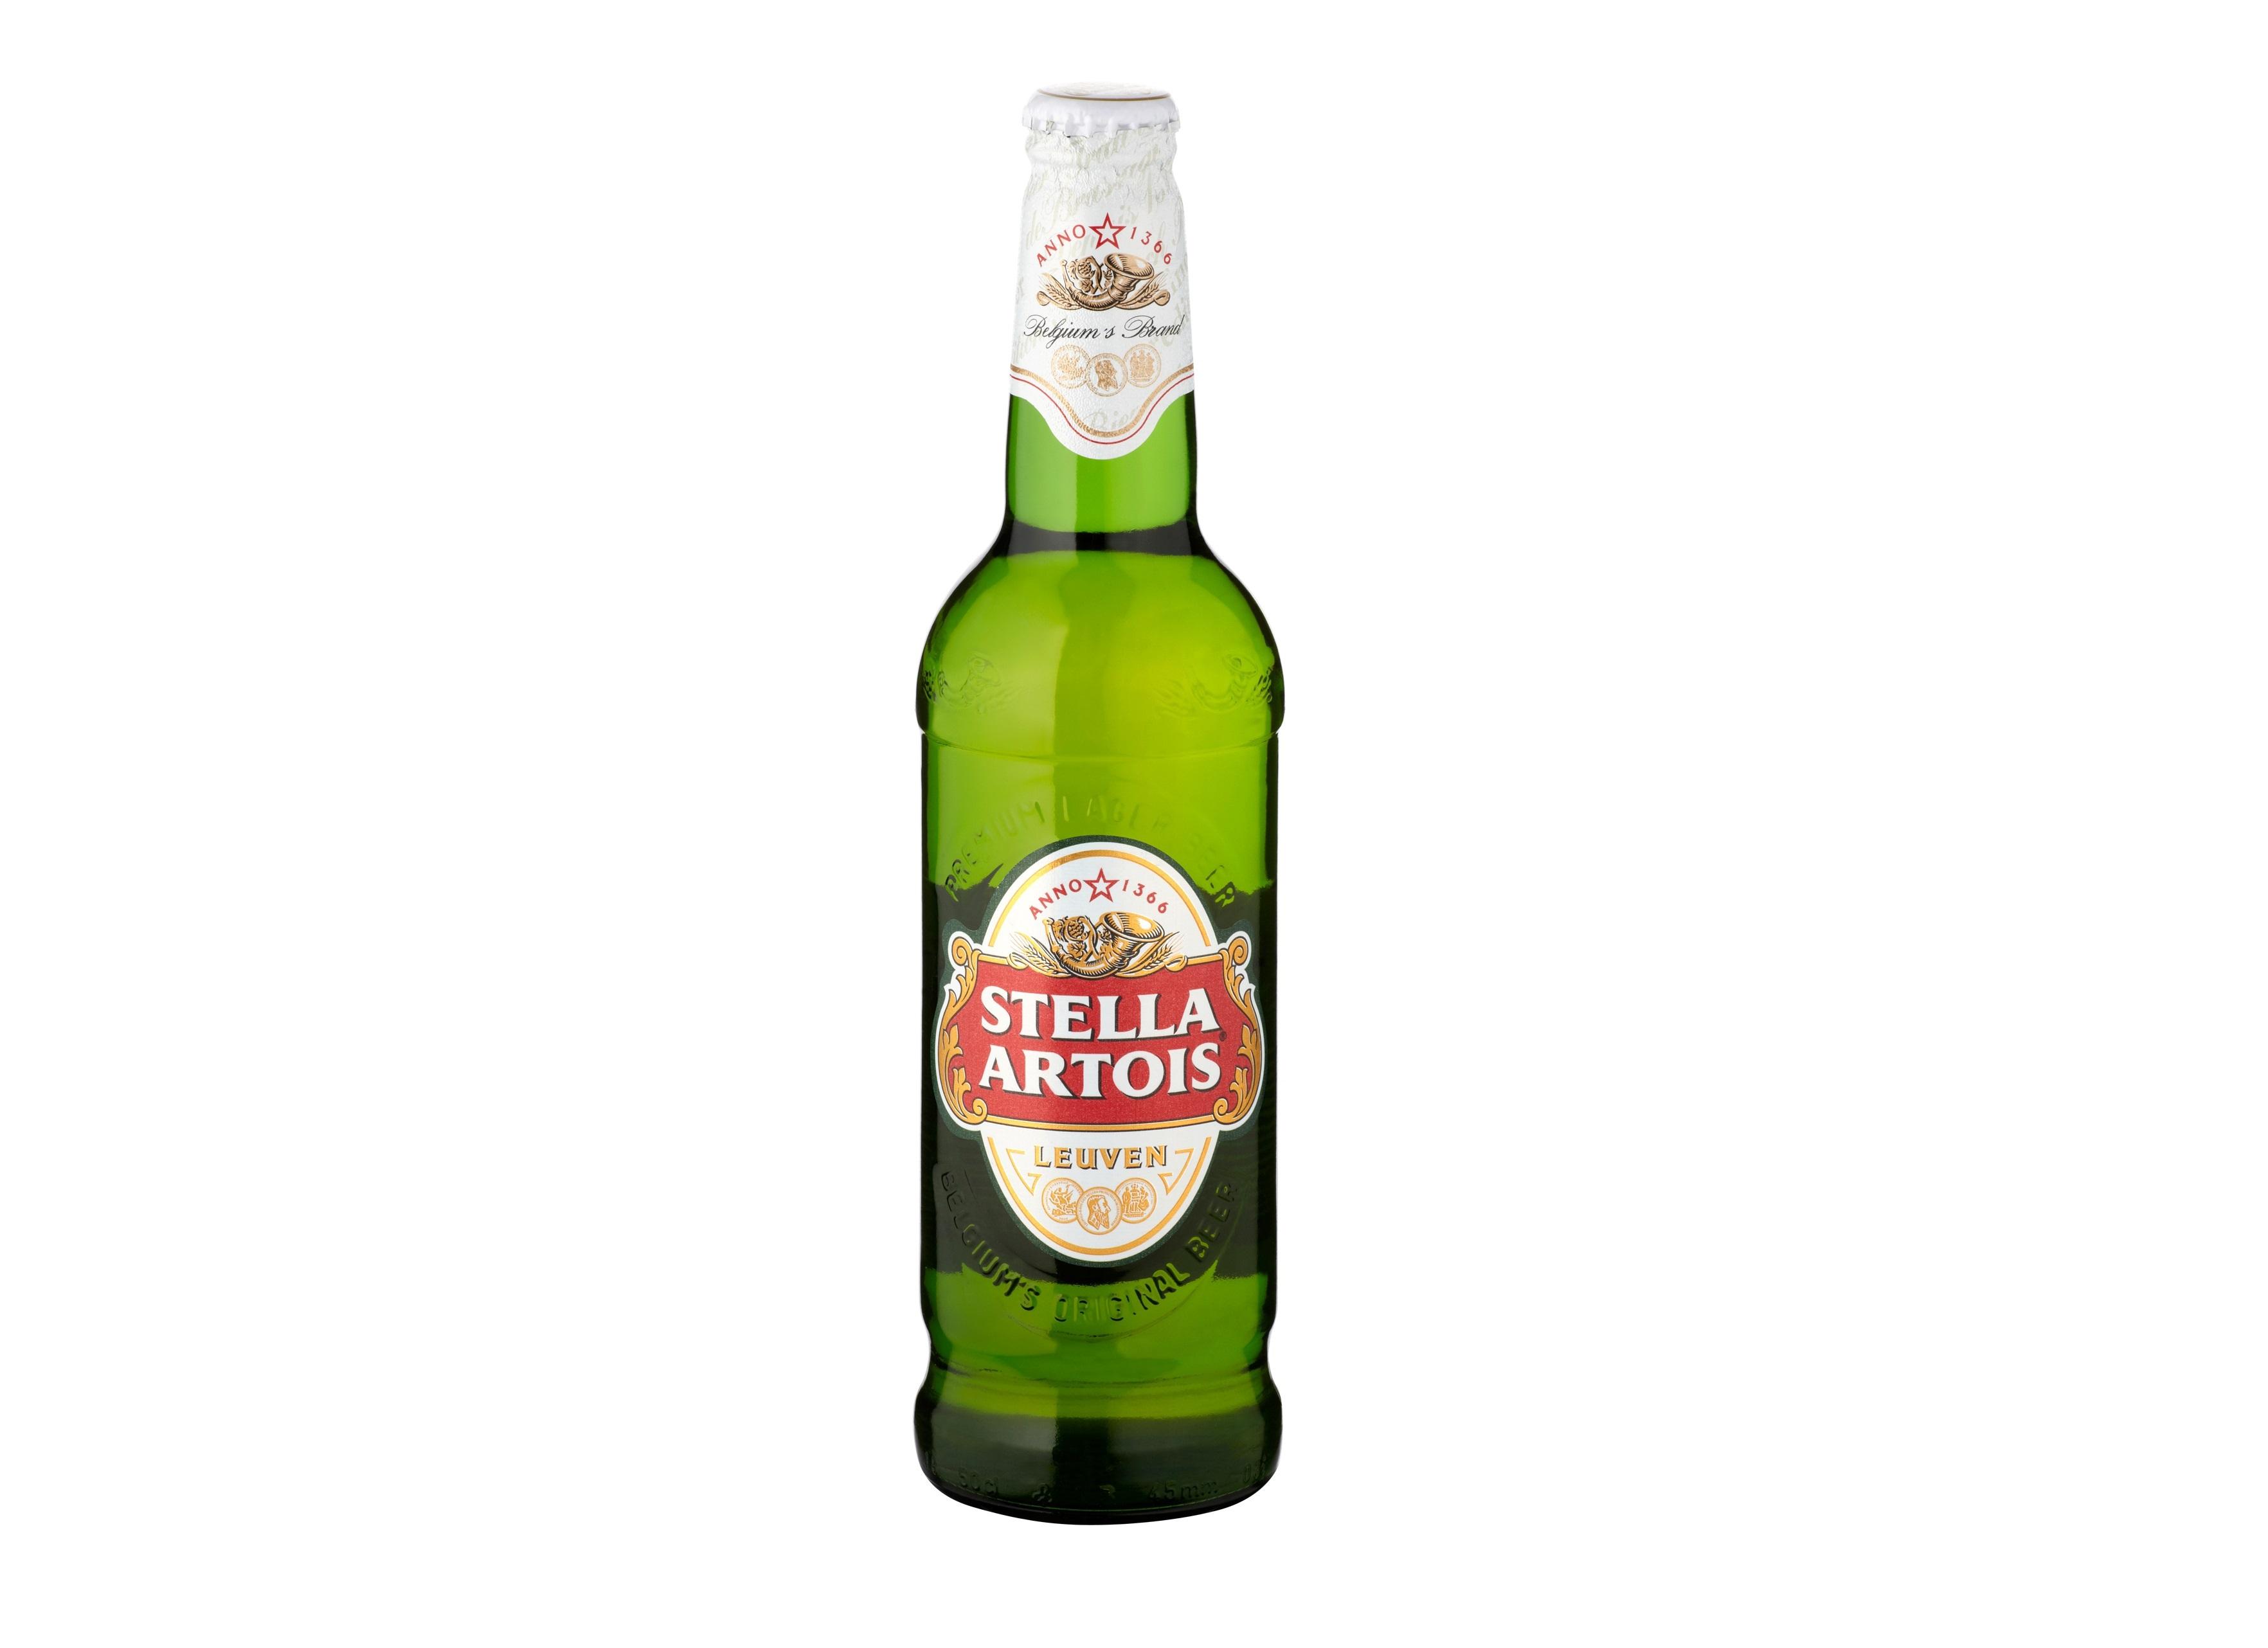 Stella Artois Wallpaper